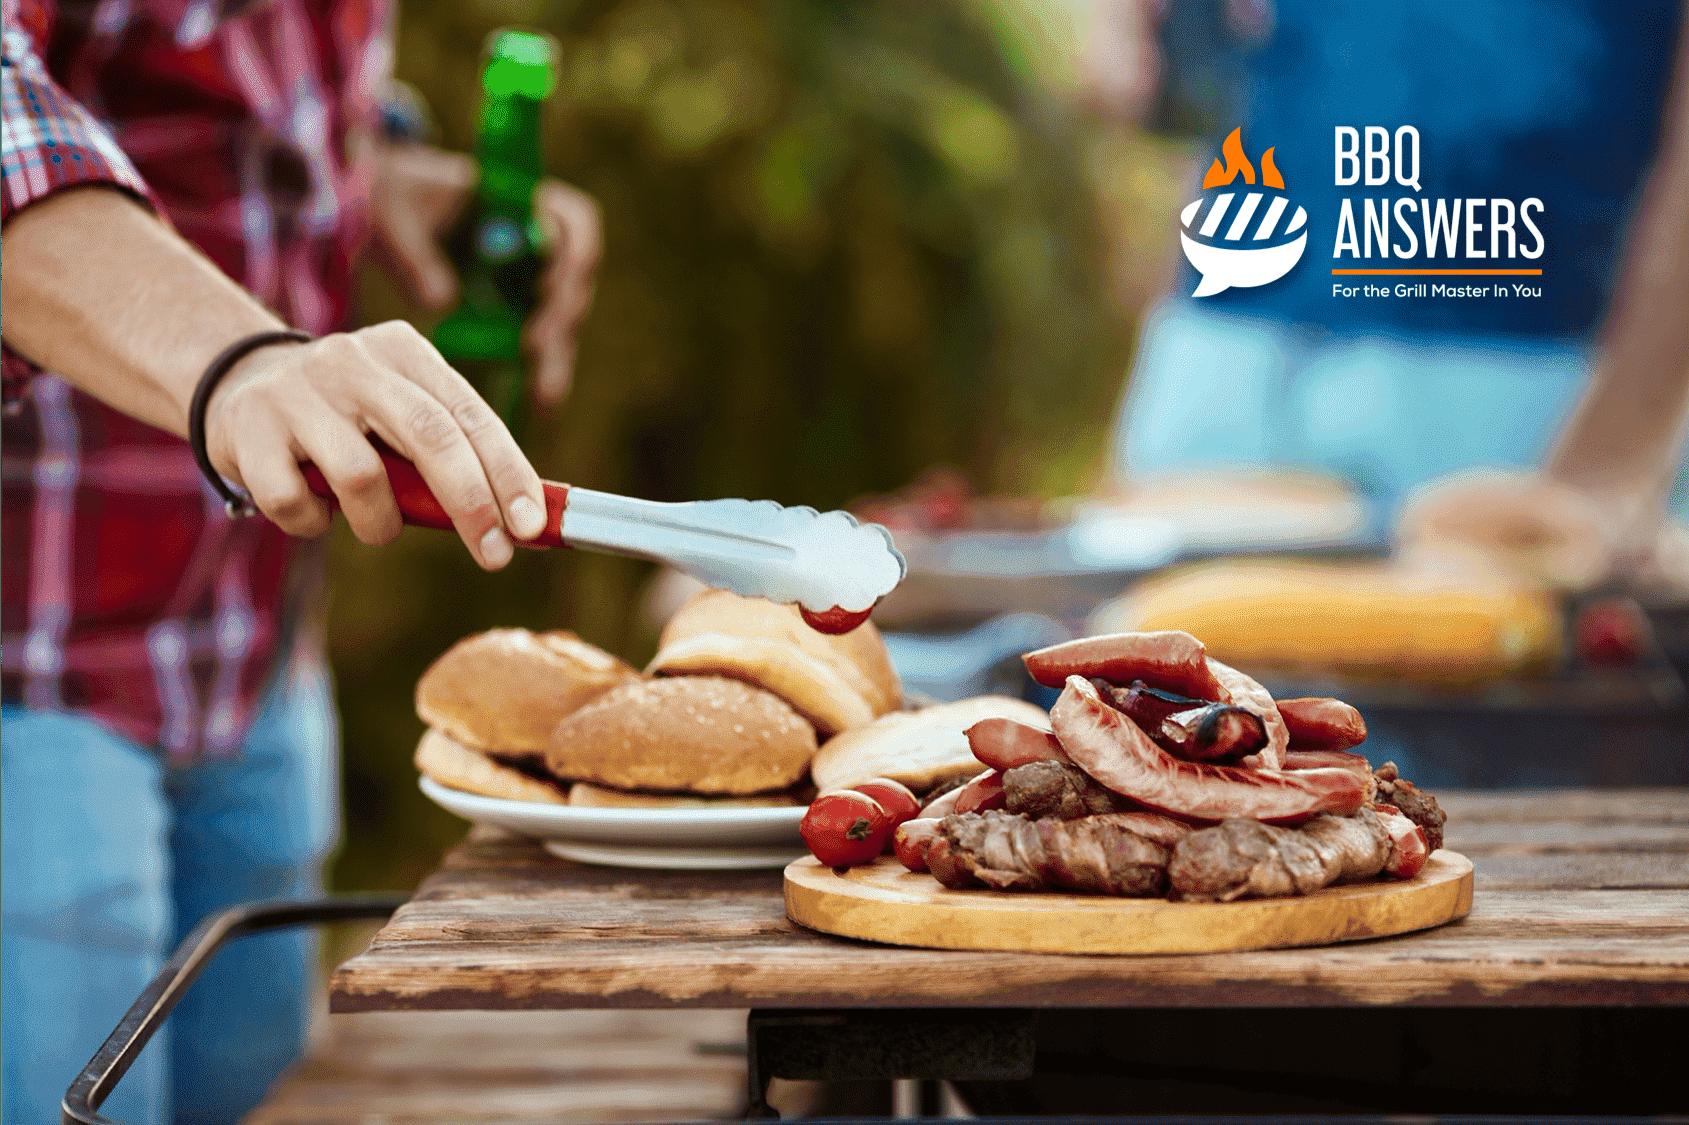 BBQ Tailgating Food Checklist | BBQanswers